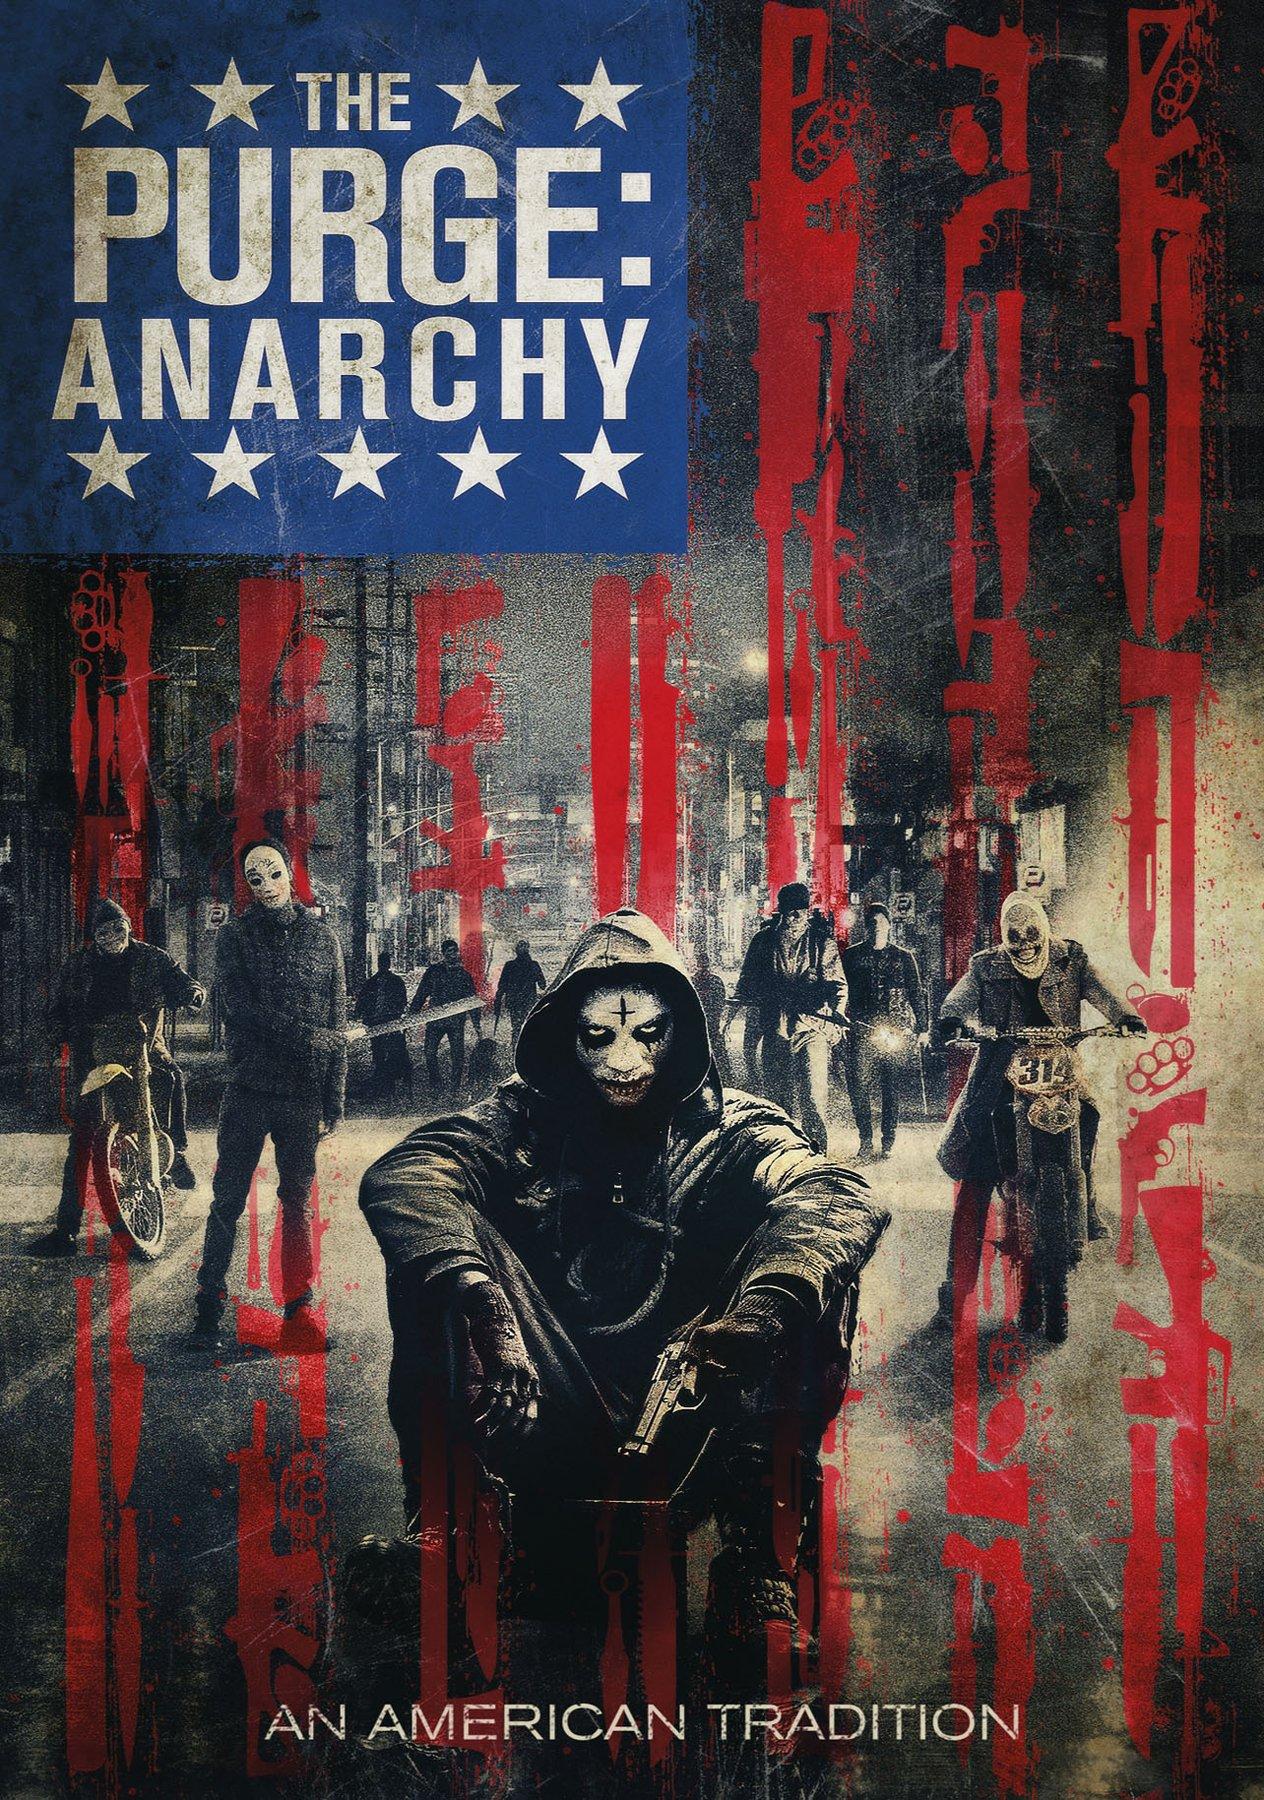 purge anarchy.jpg